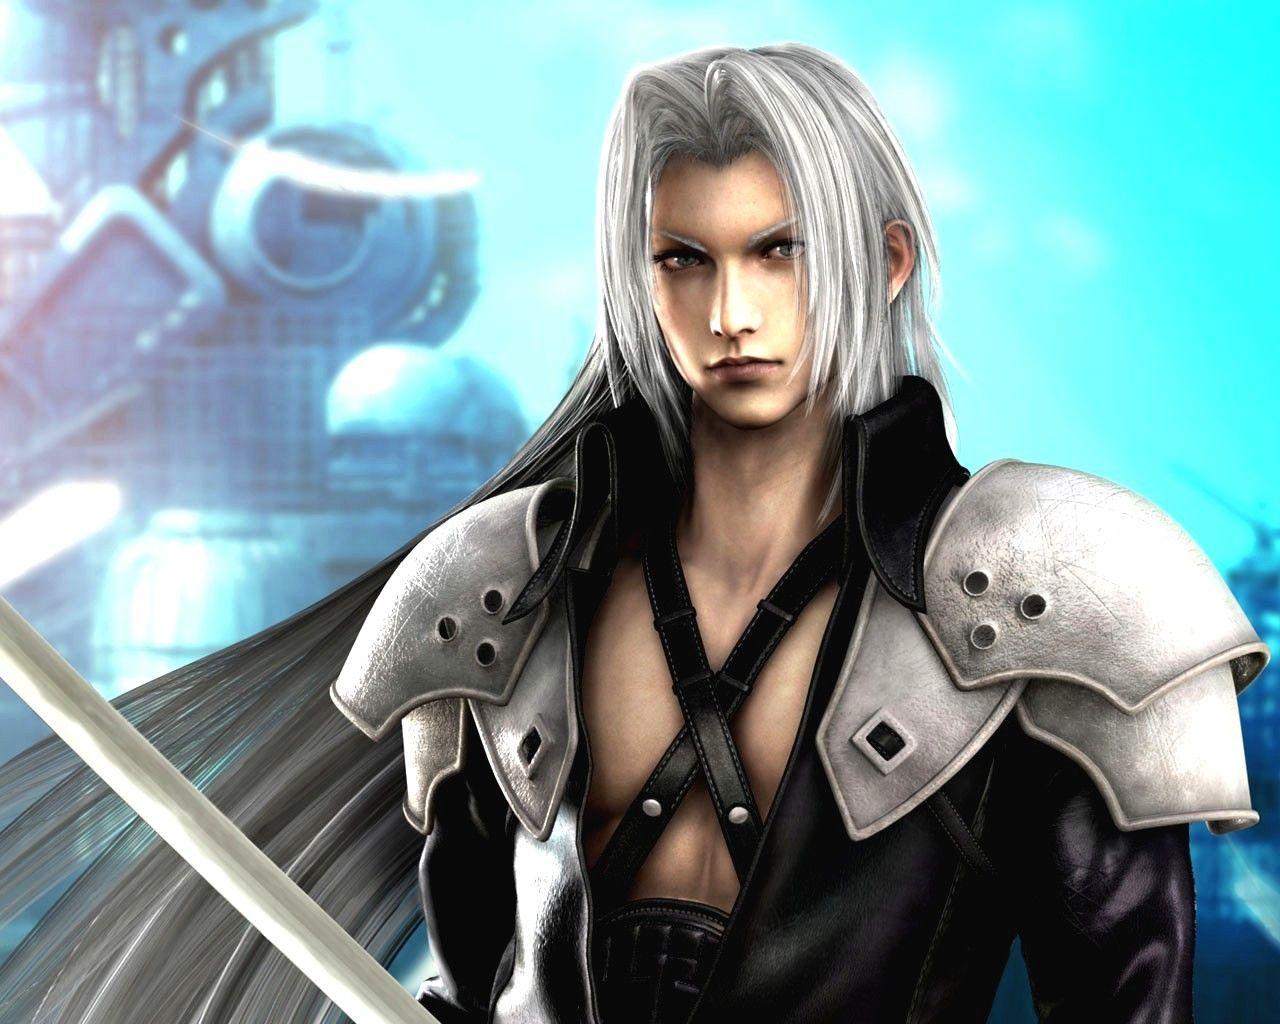 Final Fantasy 7 Sephiroth Wallpapers Hd Wallpaper Cave